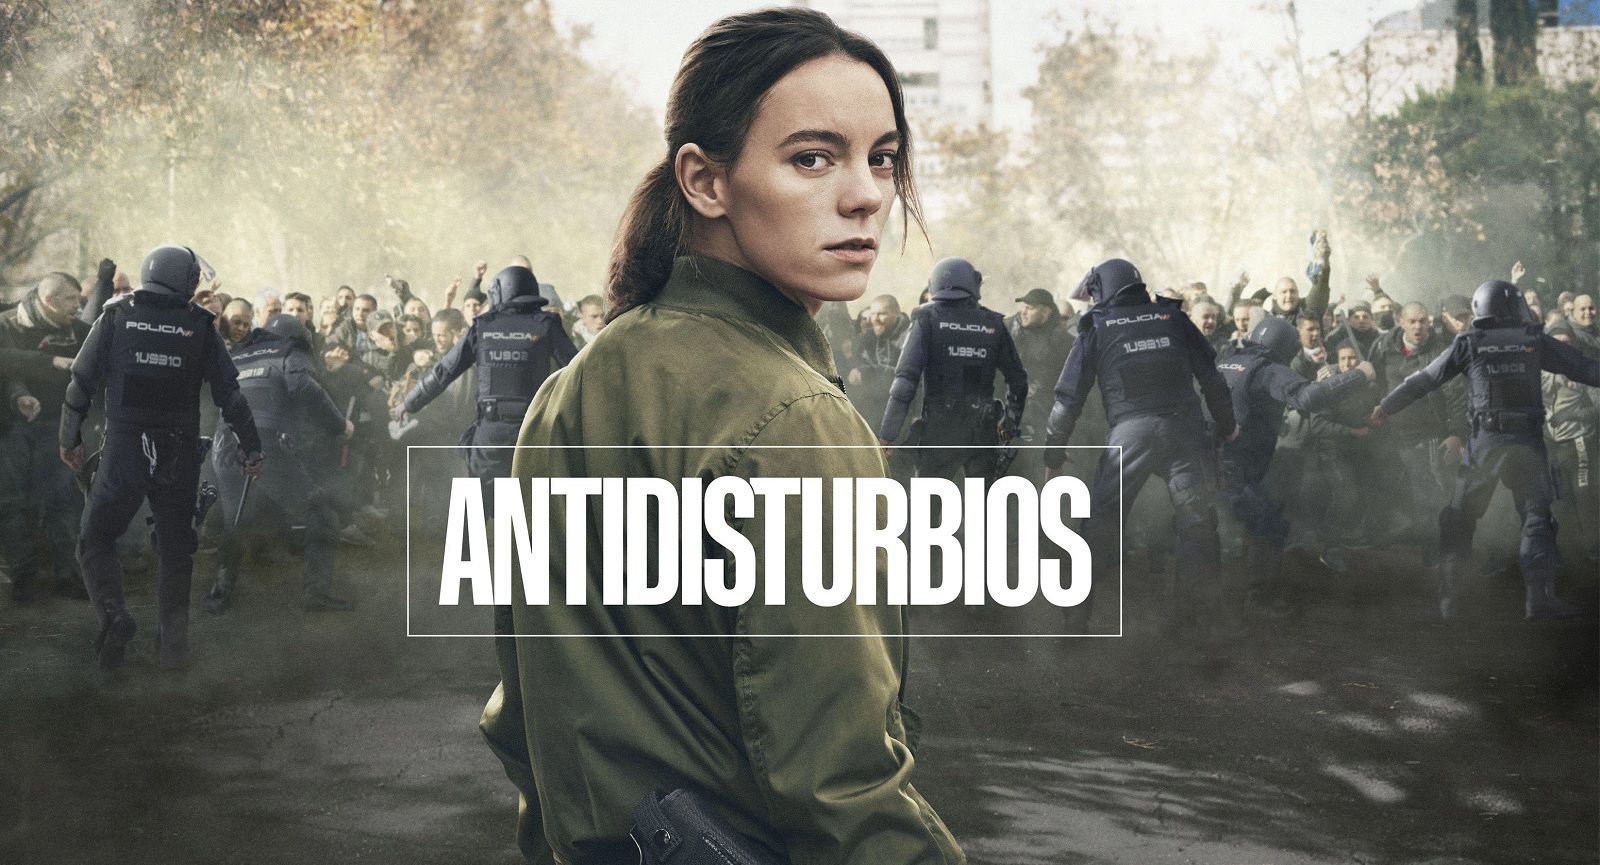 Antidisturbios, la série qui s'attaque aux violences policières